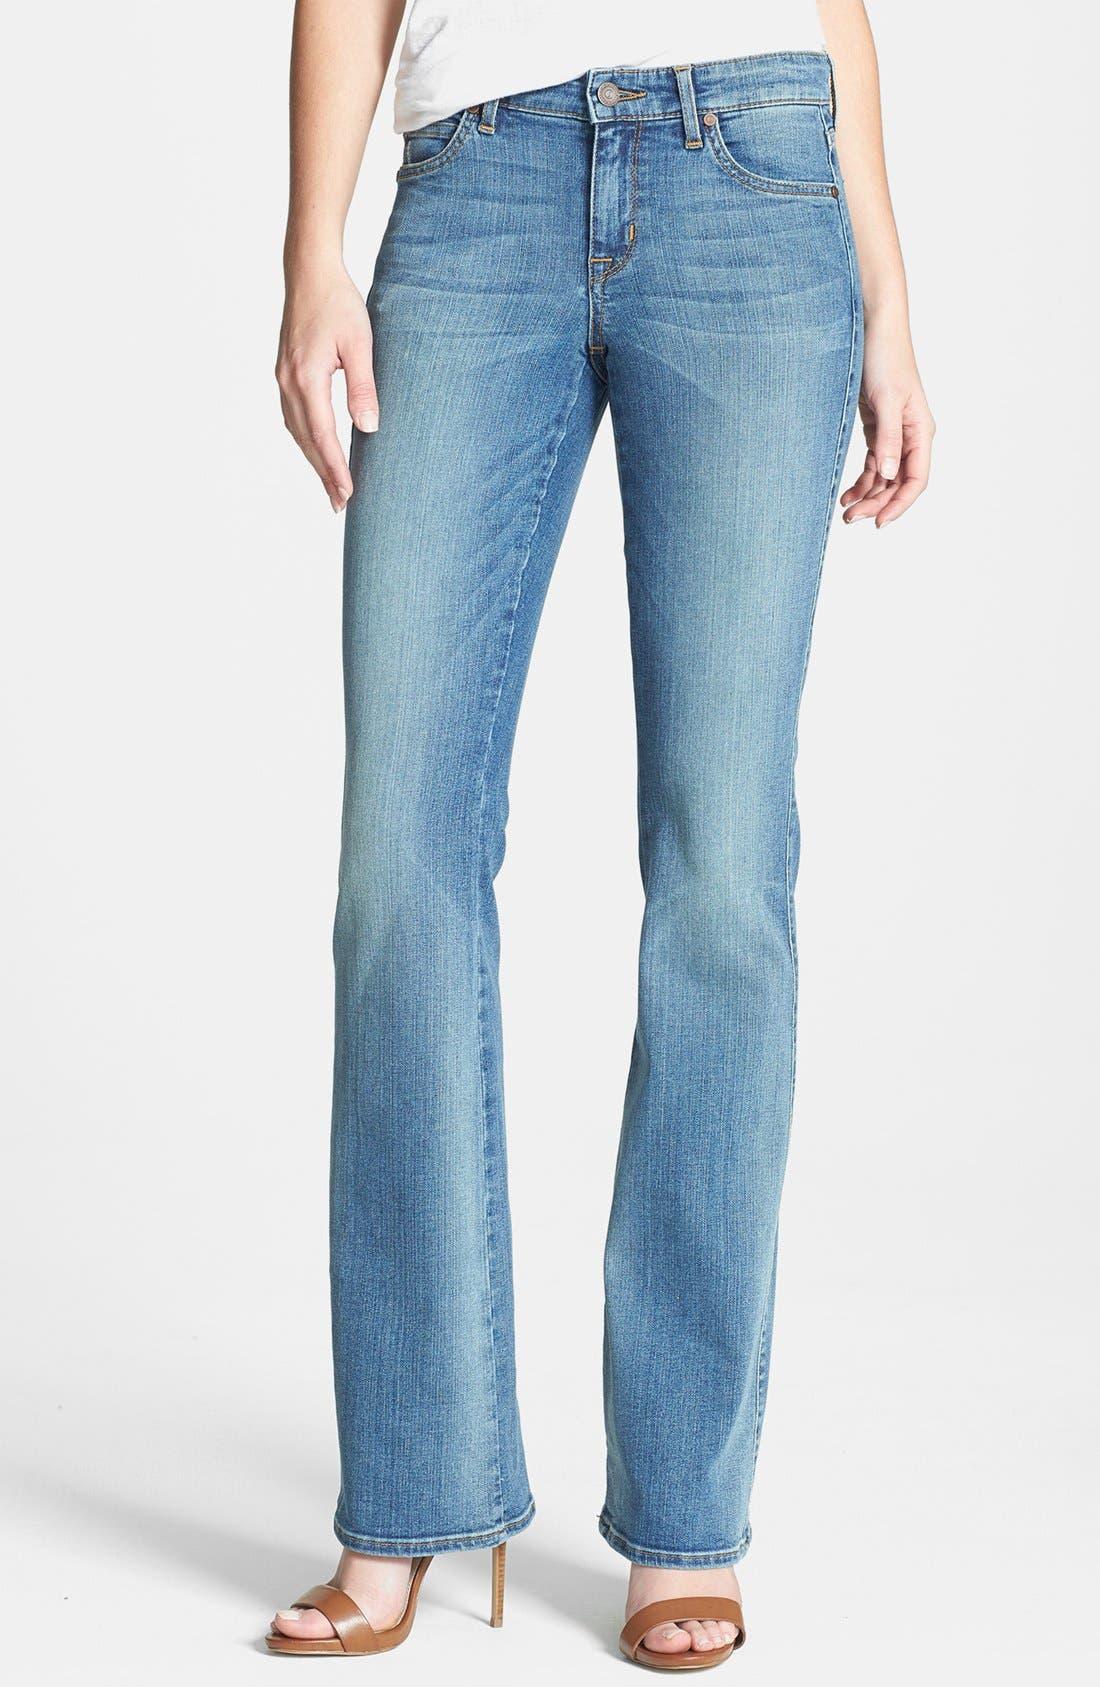 Alternate Image 1 Selected - CJ by Cookie Johnson 'Grace' Bootcut Jeans (Aliamanu)